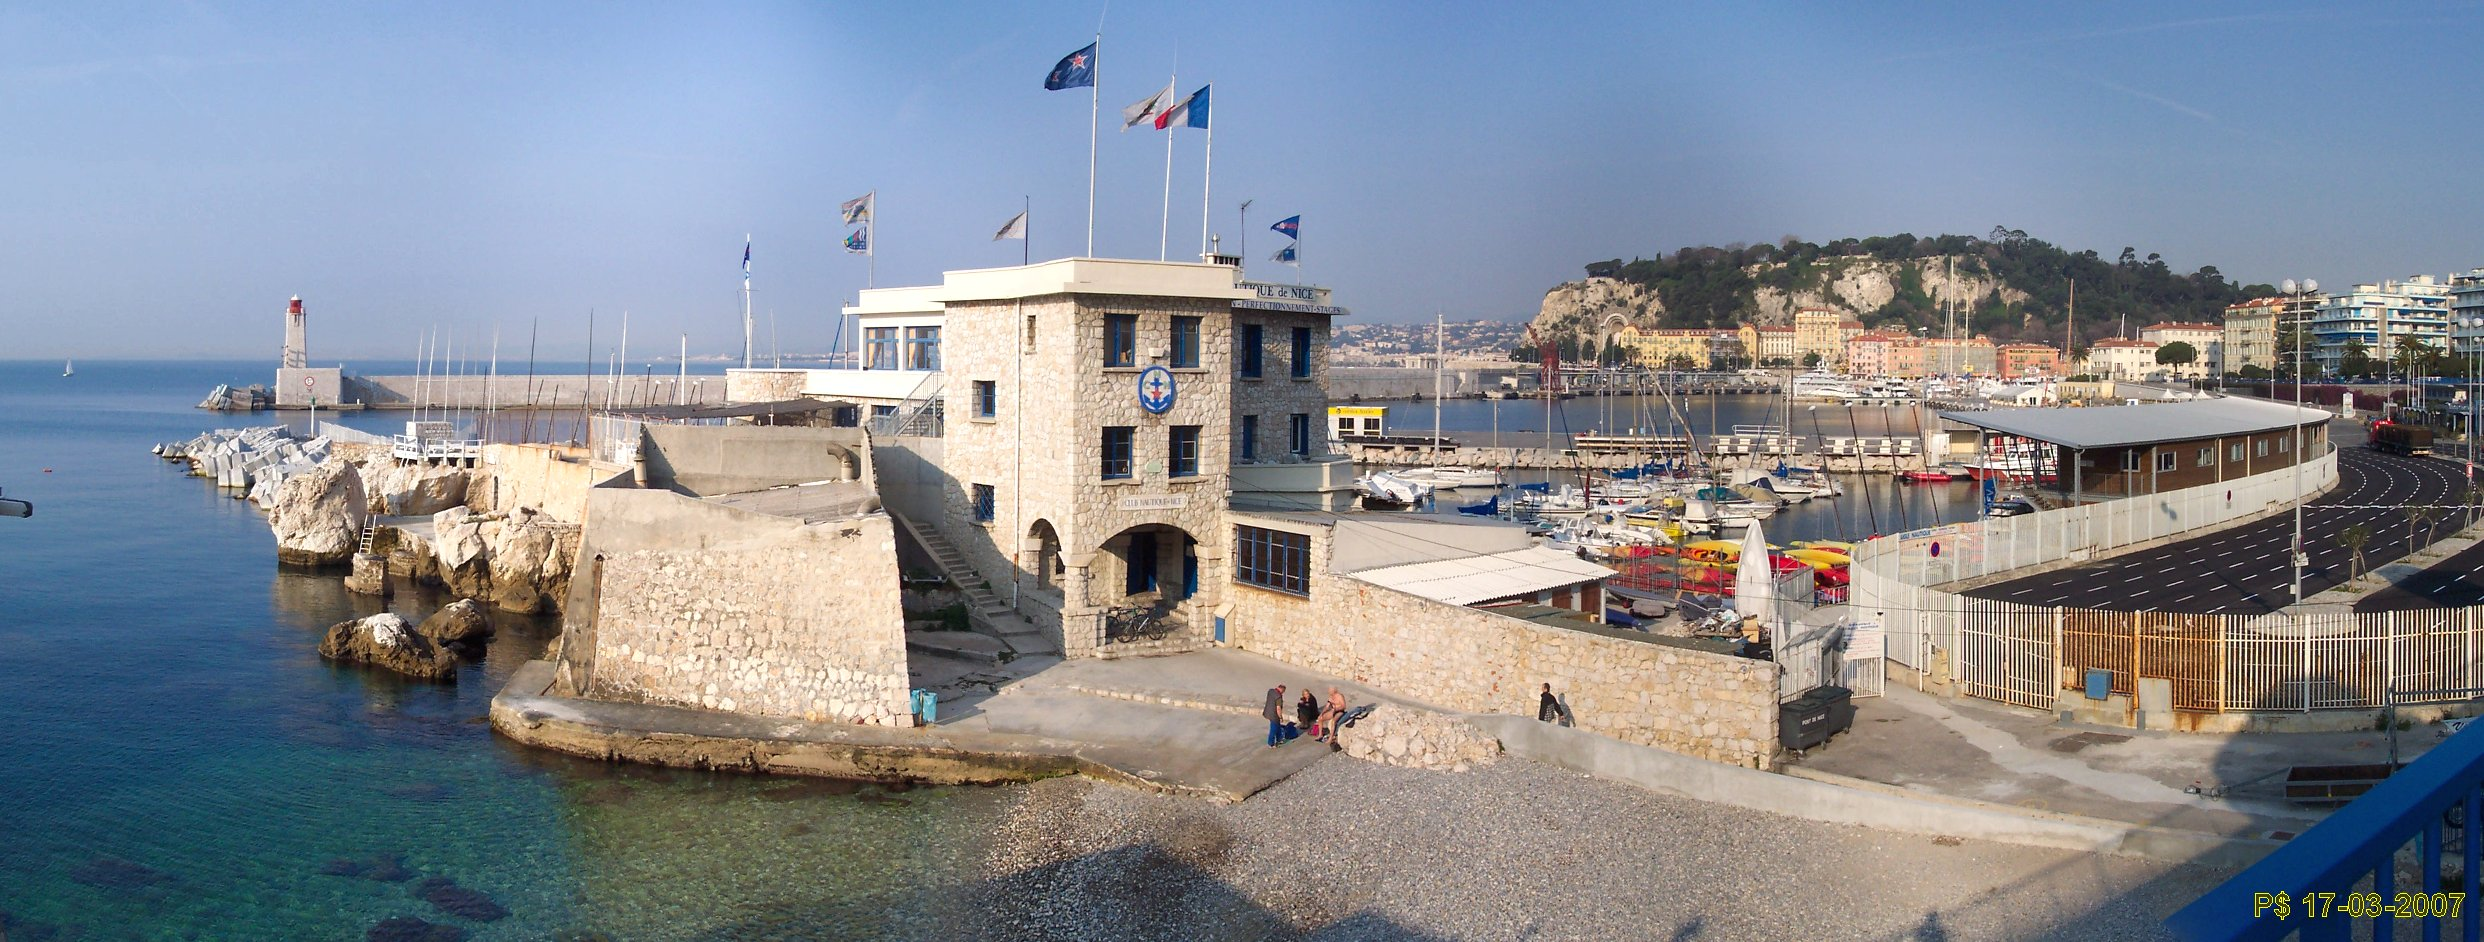 Club Nautique De Nice file:nikaia-port-club nautique pano - wikimedia commons